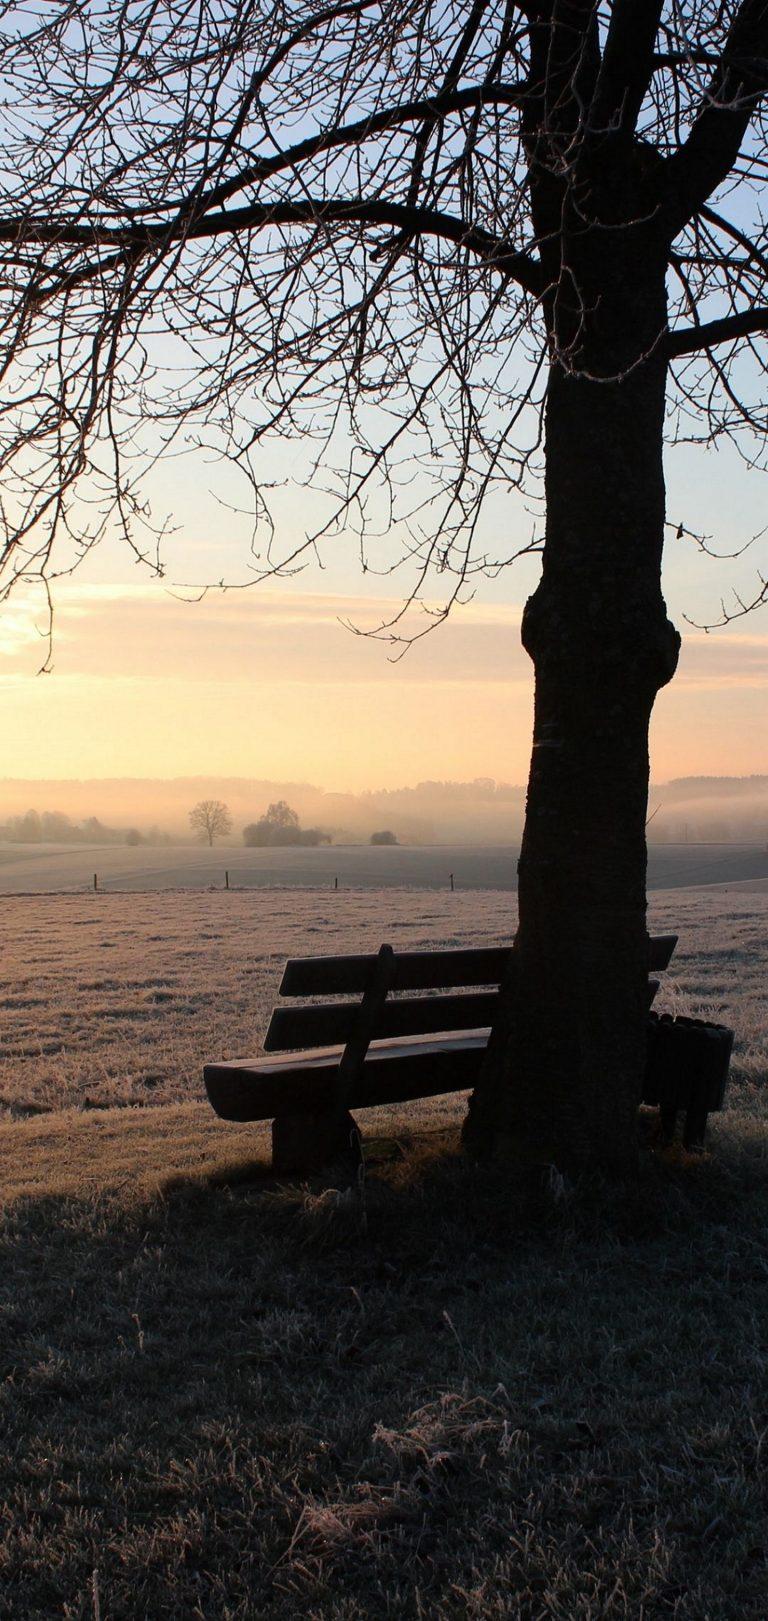 Winter Bench Frost Wallpaper 1440x3040 768x1621